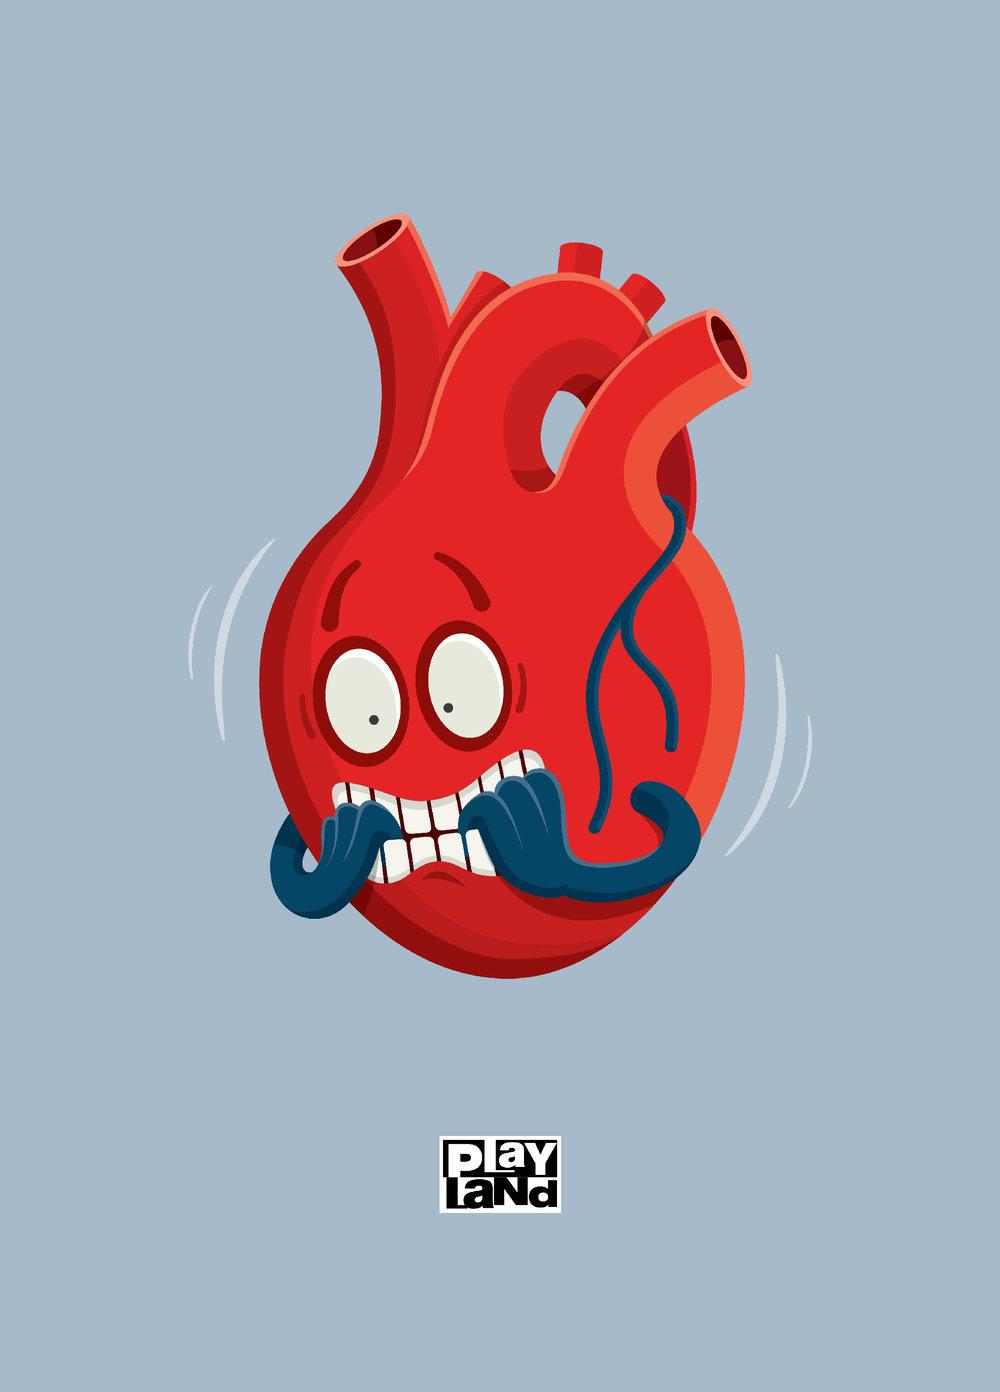 Playland-organs_heart.jpg